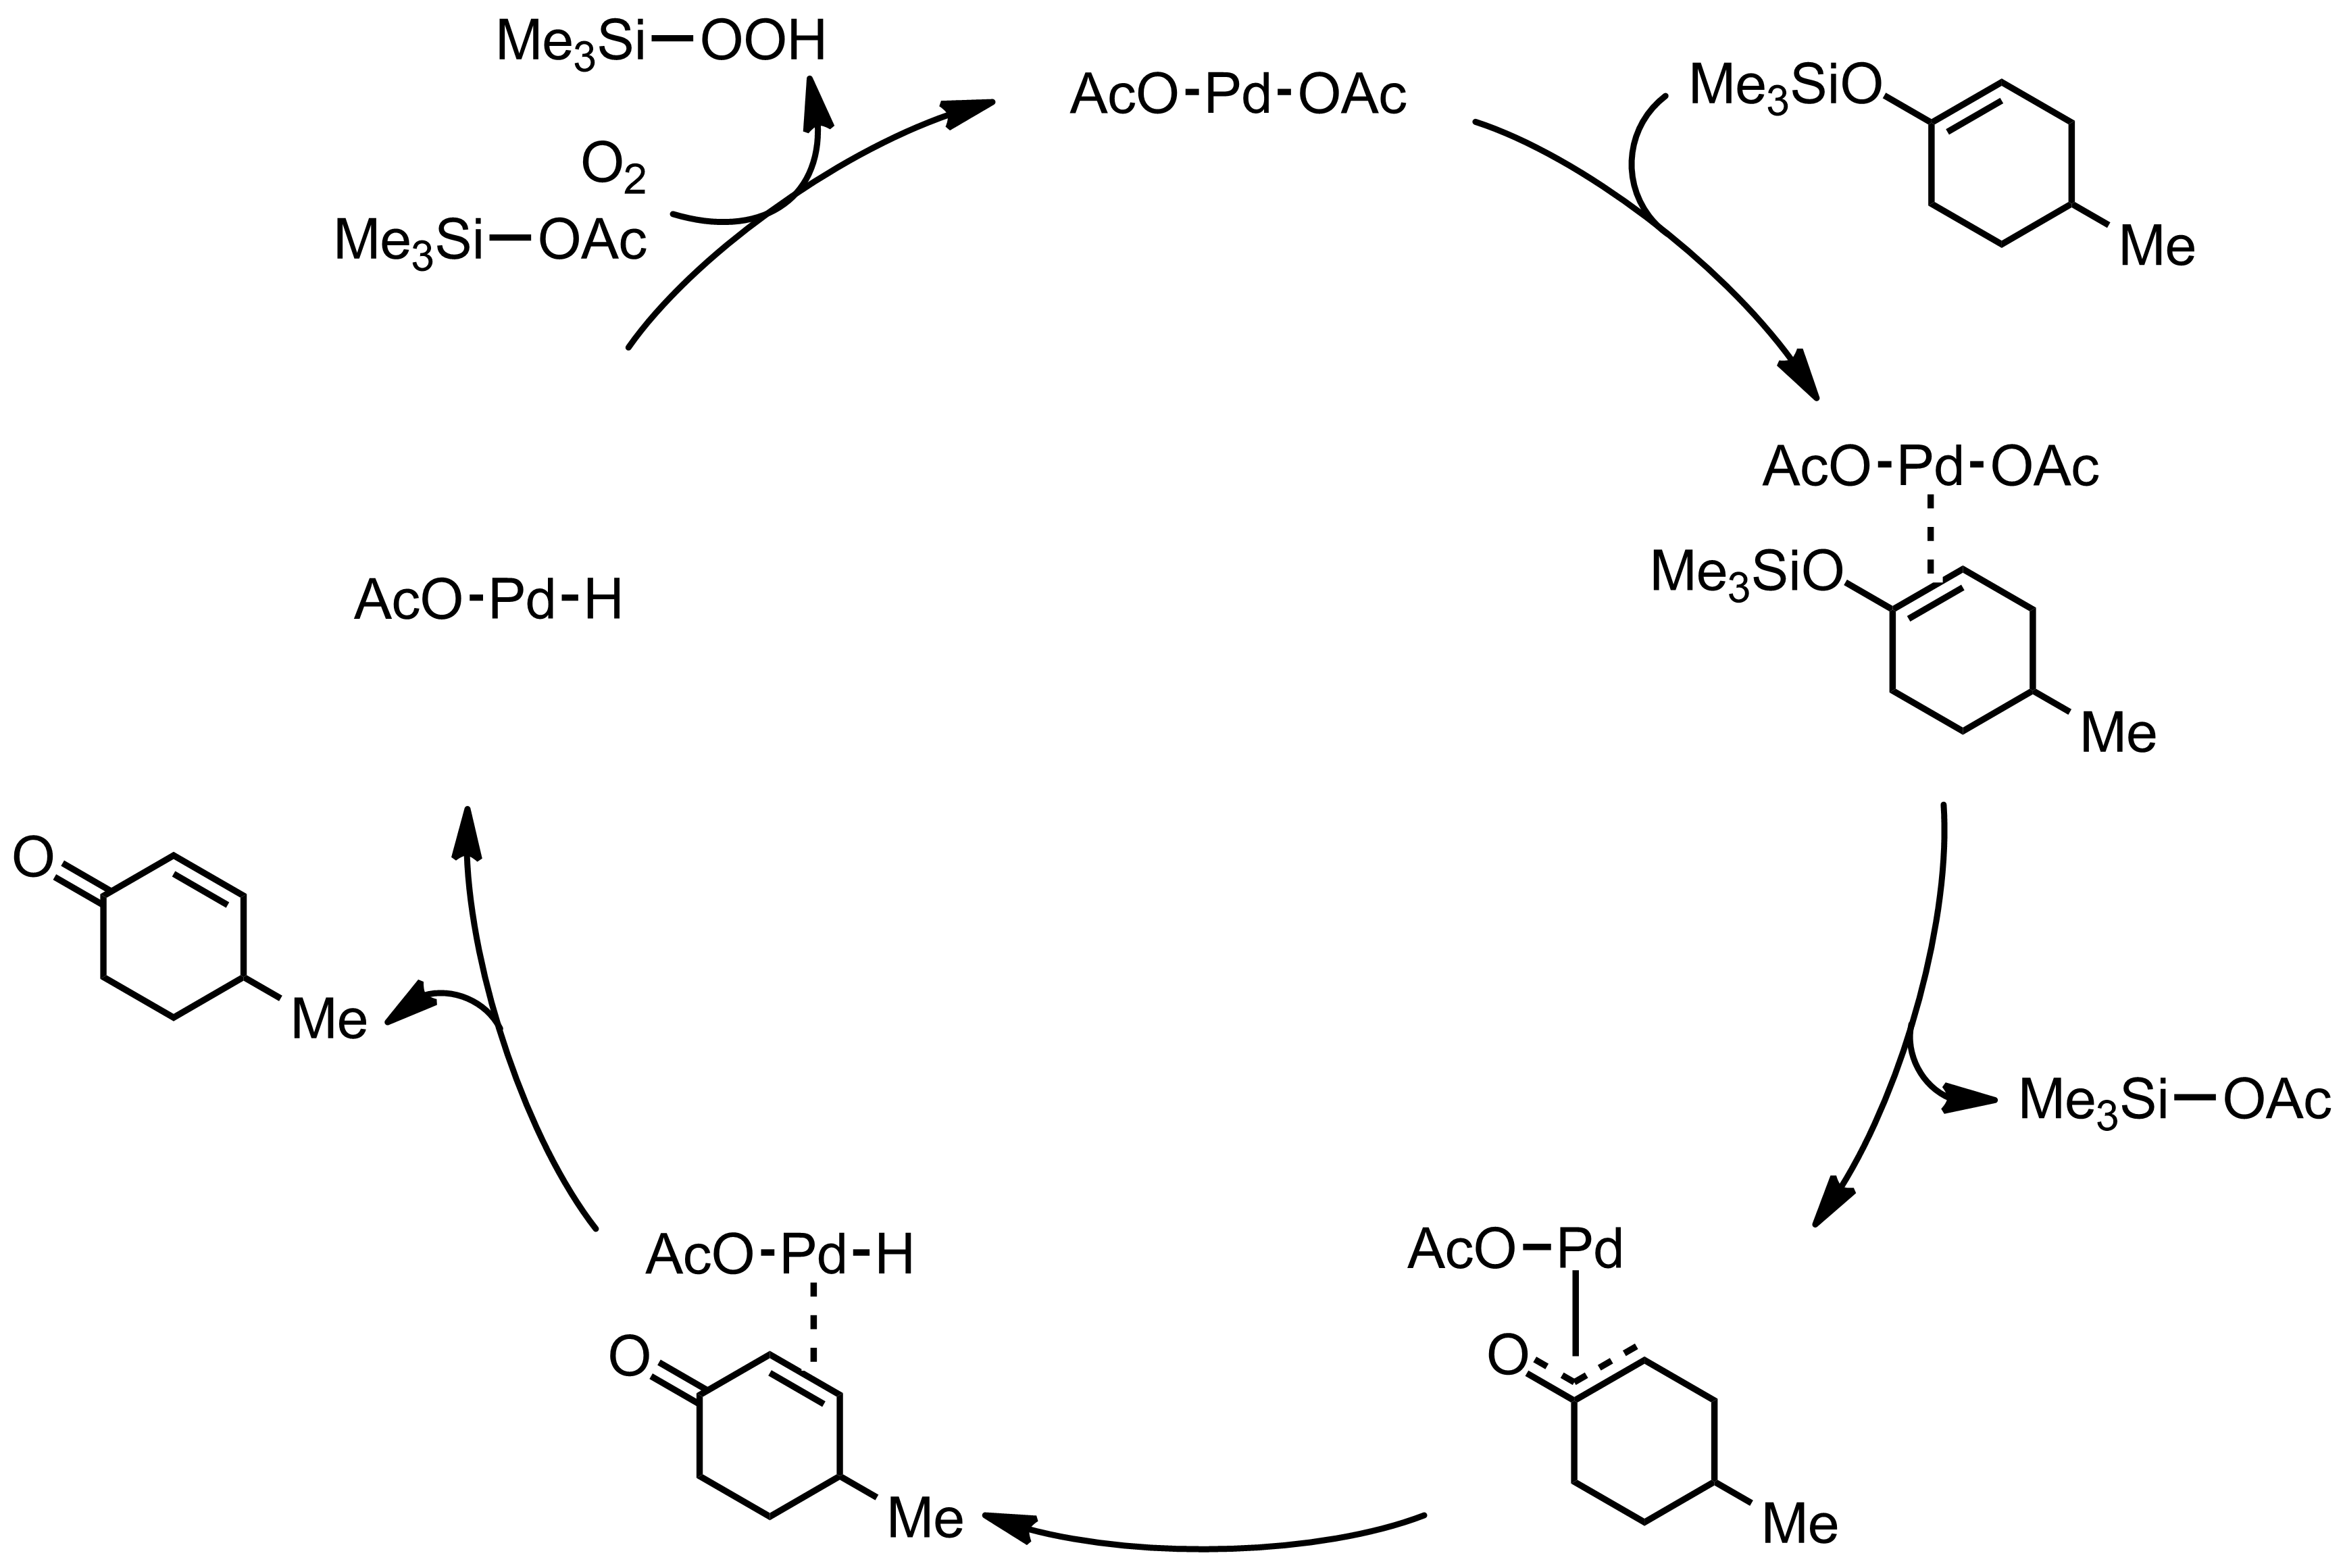 Mechanism of the Saegusa-Ito Oxidation